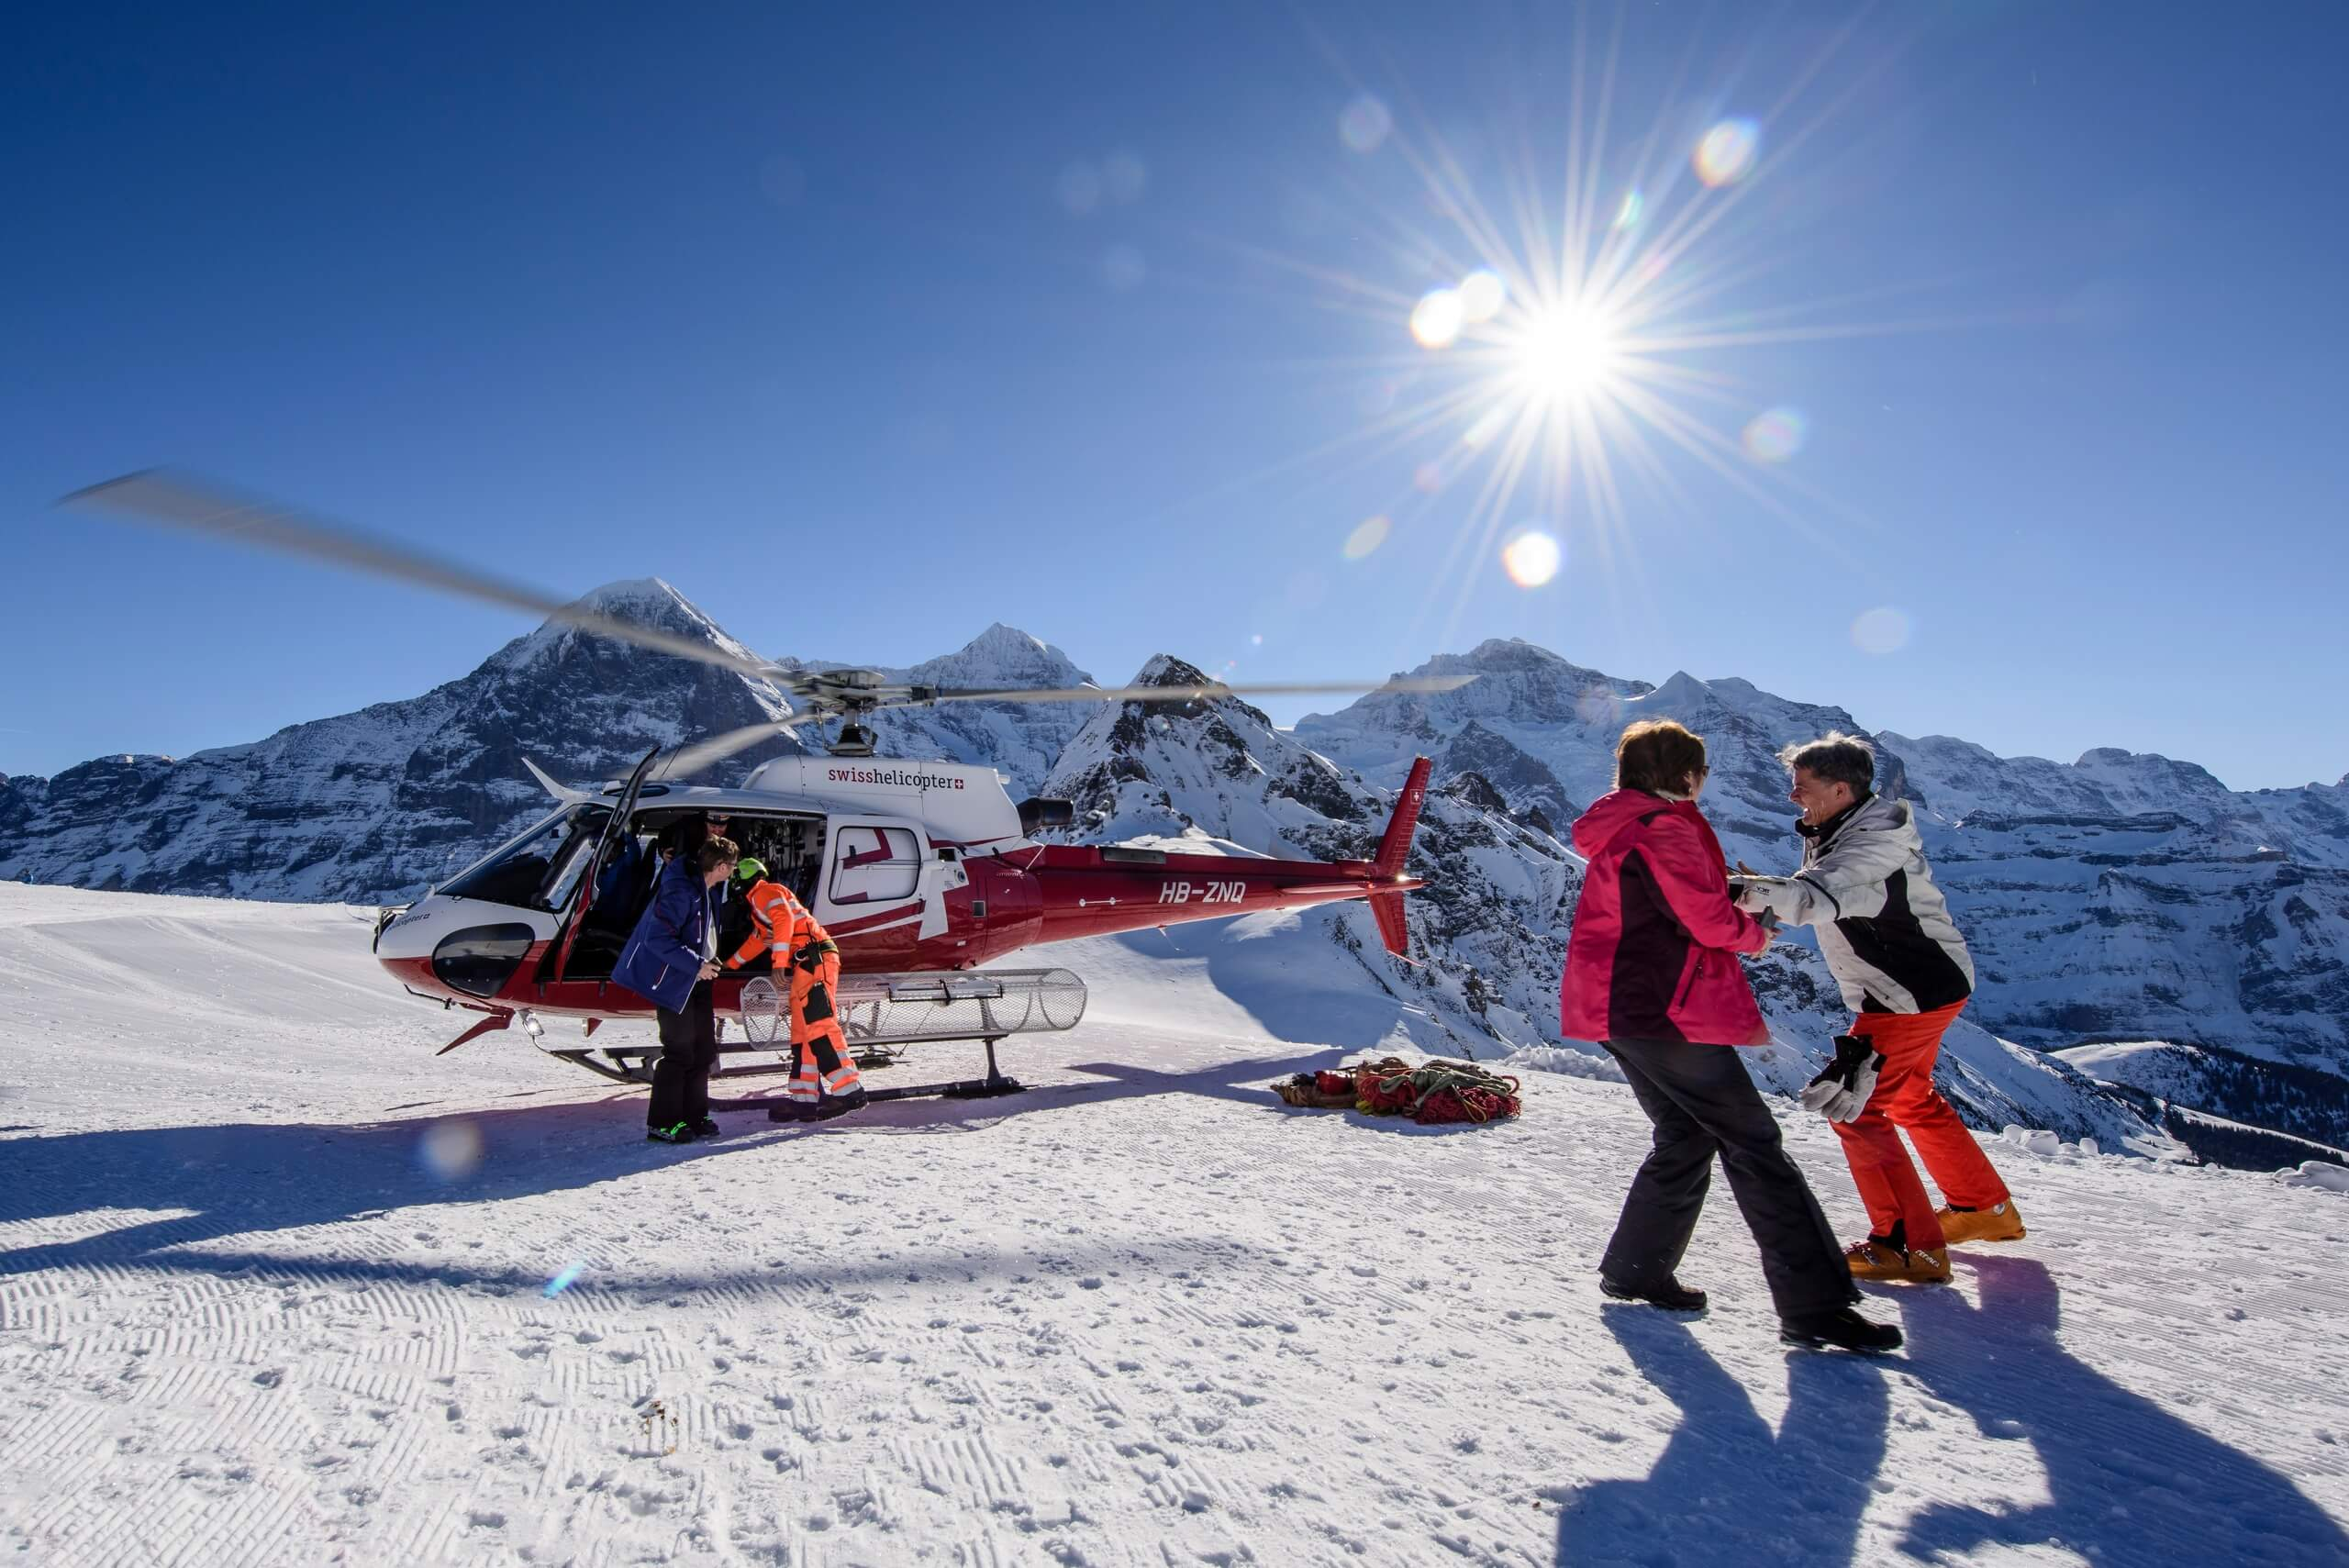 swiss-helicopter-berge-panorama-winter-abflug